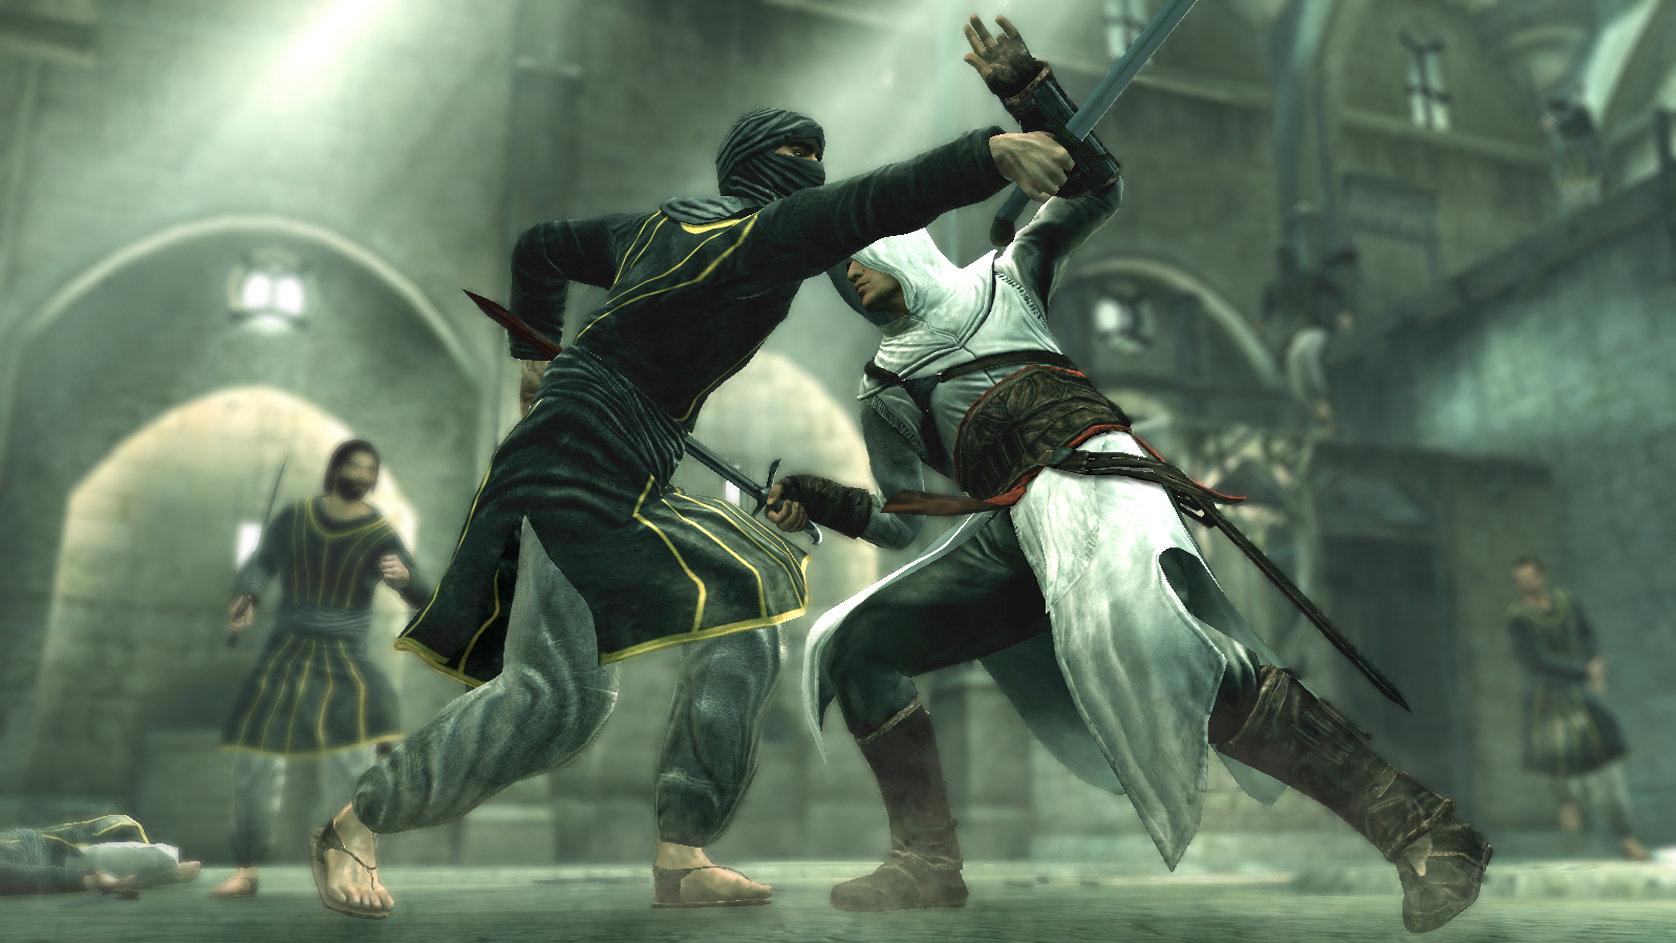 Assassin's Creed   E³, 11.07.07